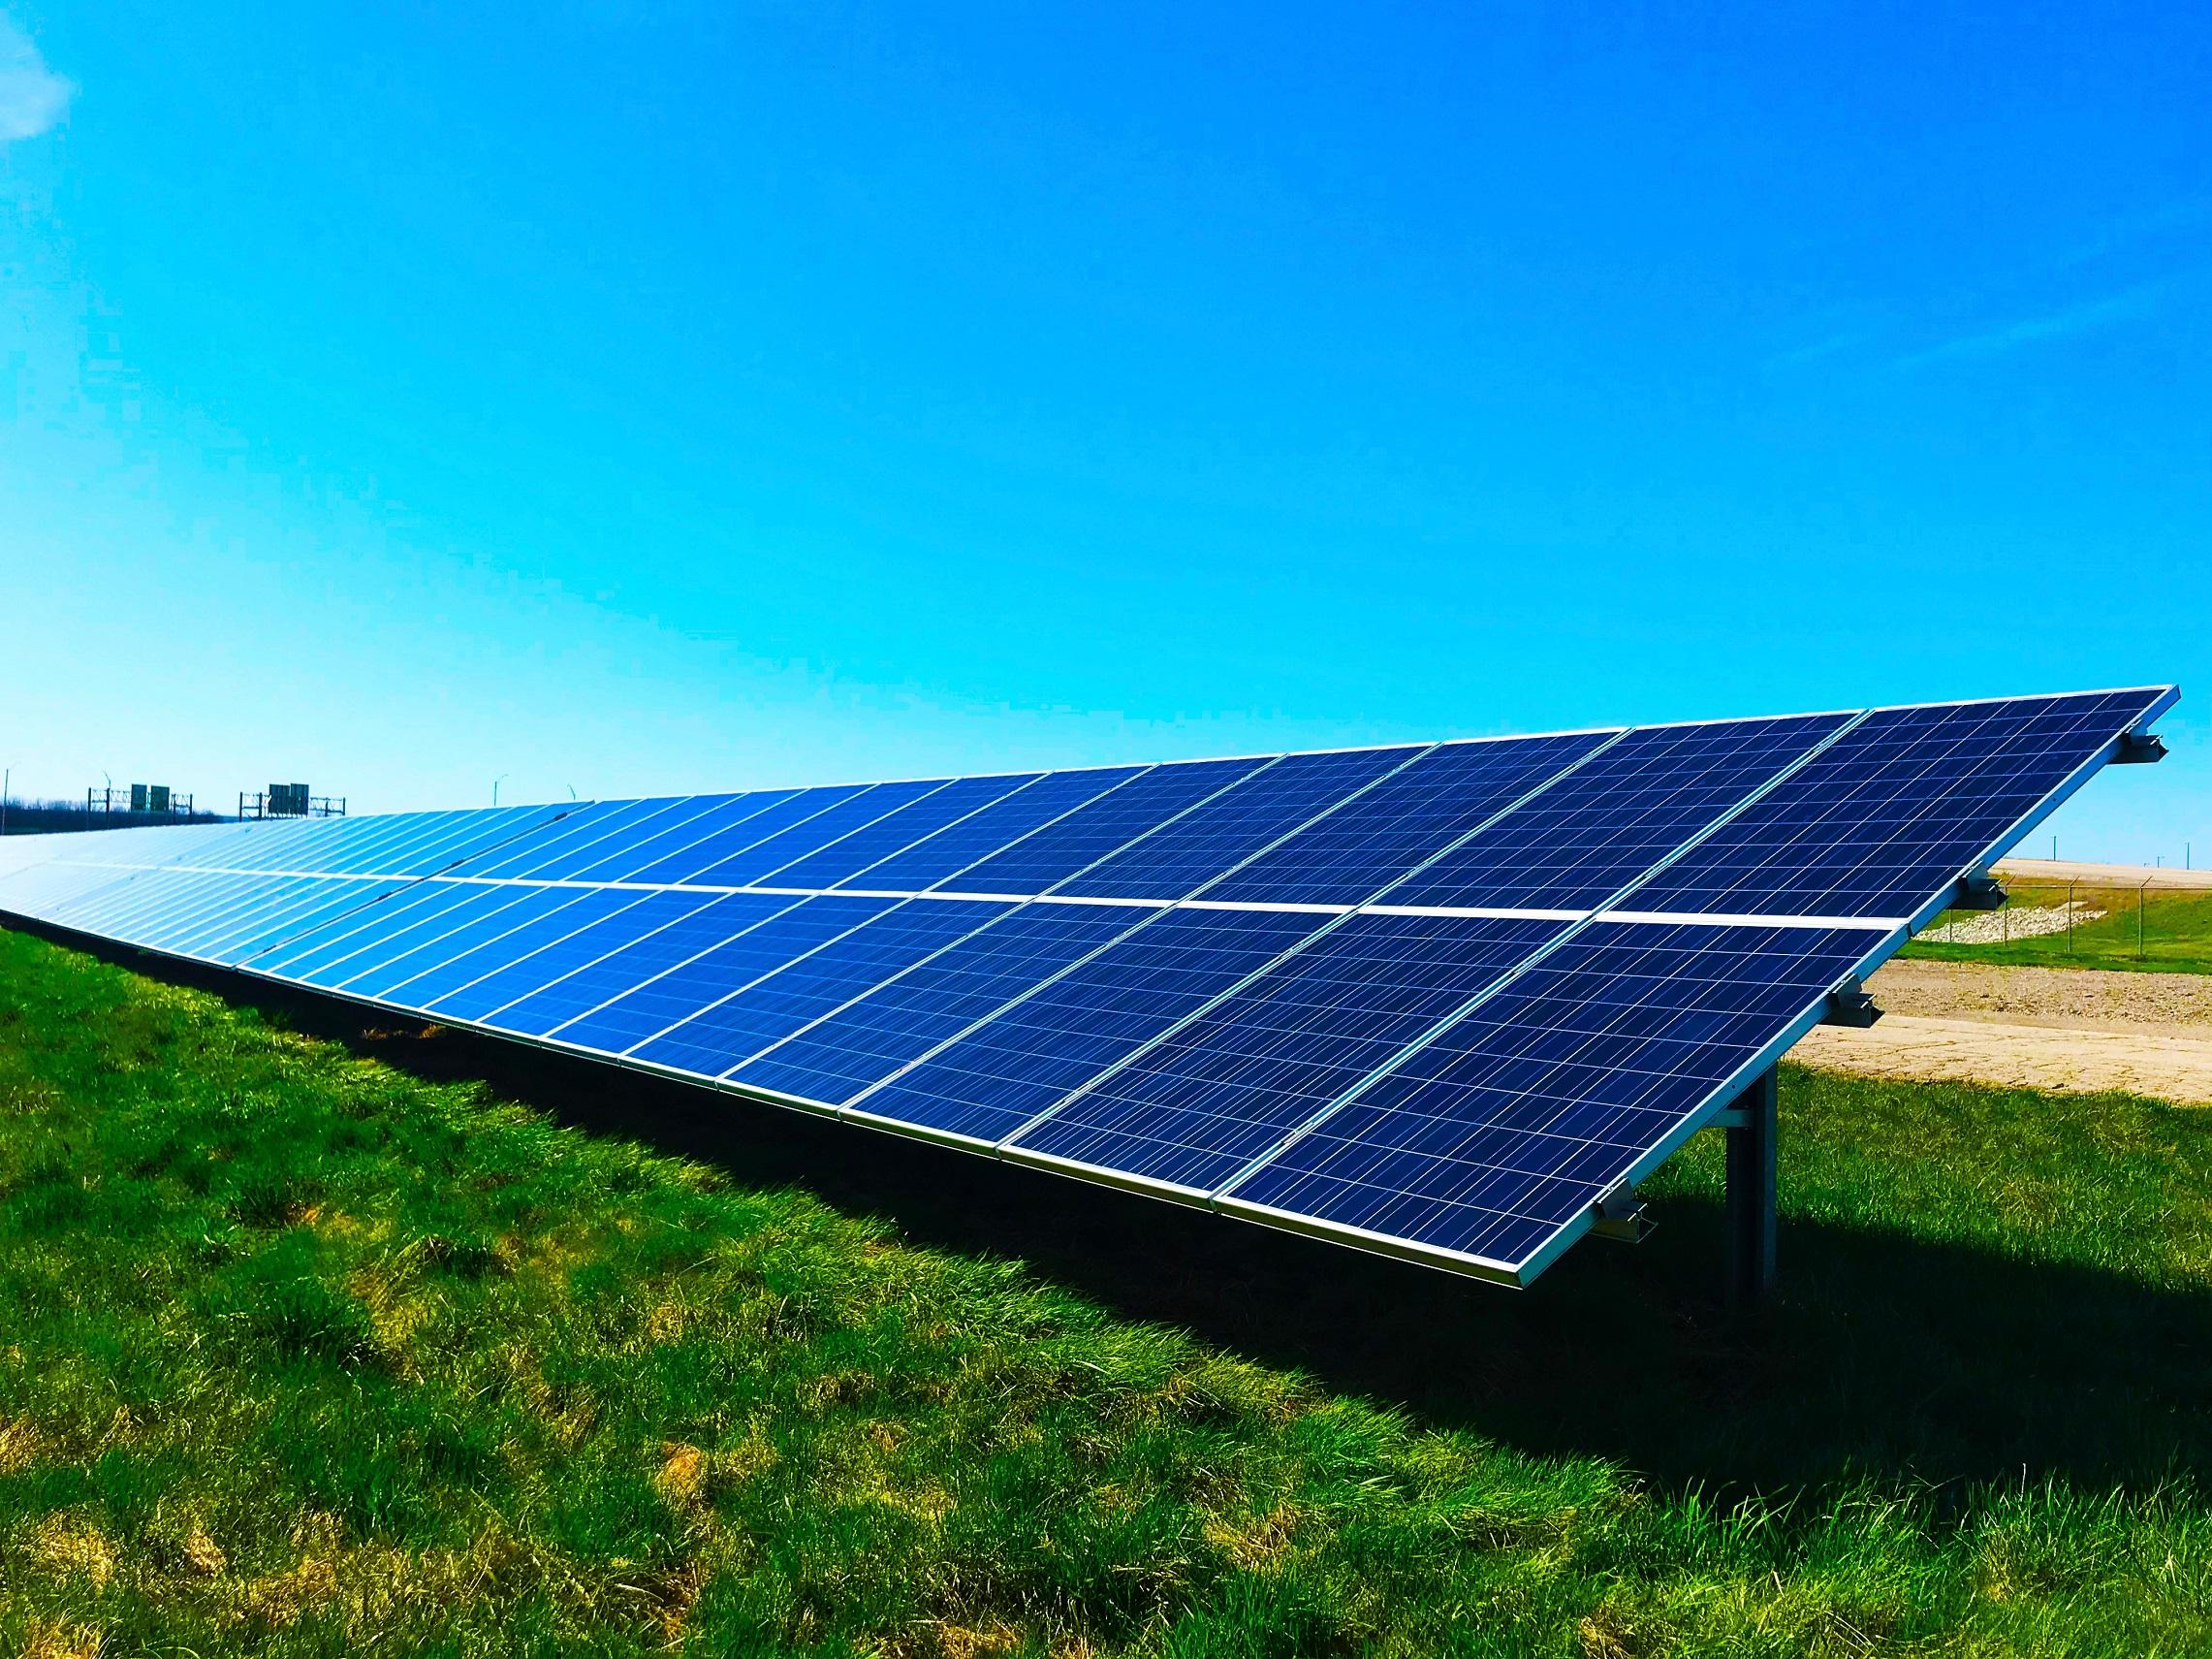 AleaSoft - Solar photovoltaic panels